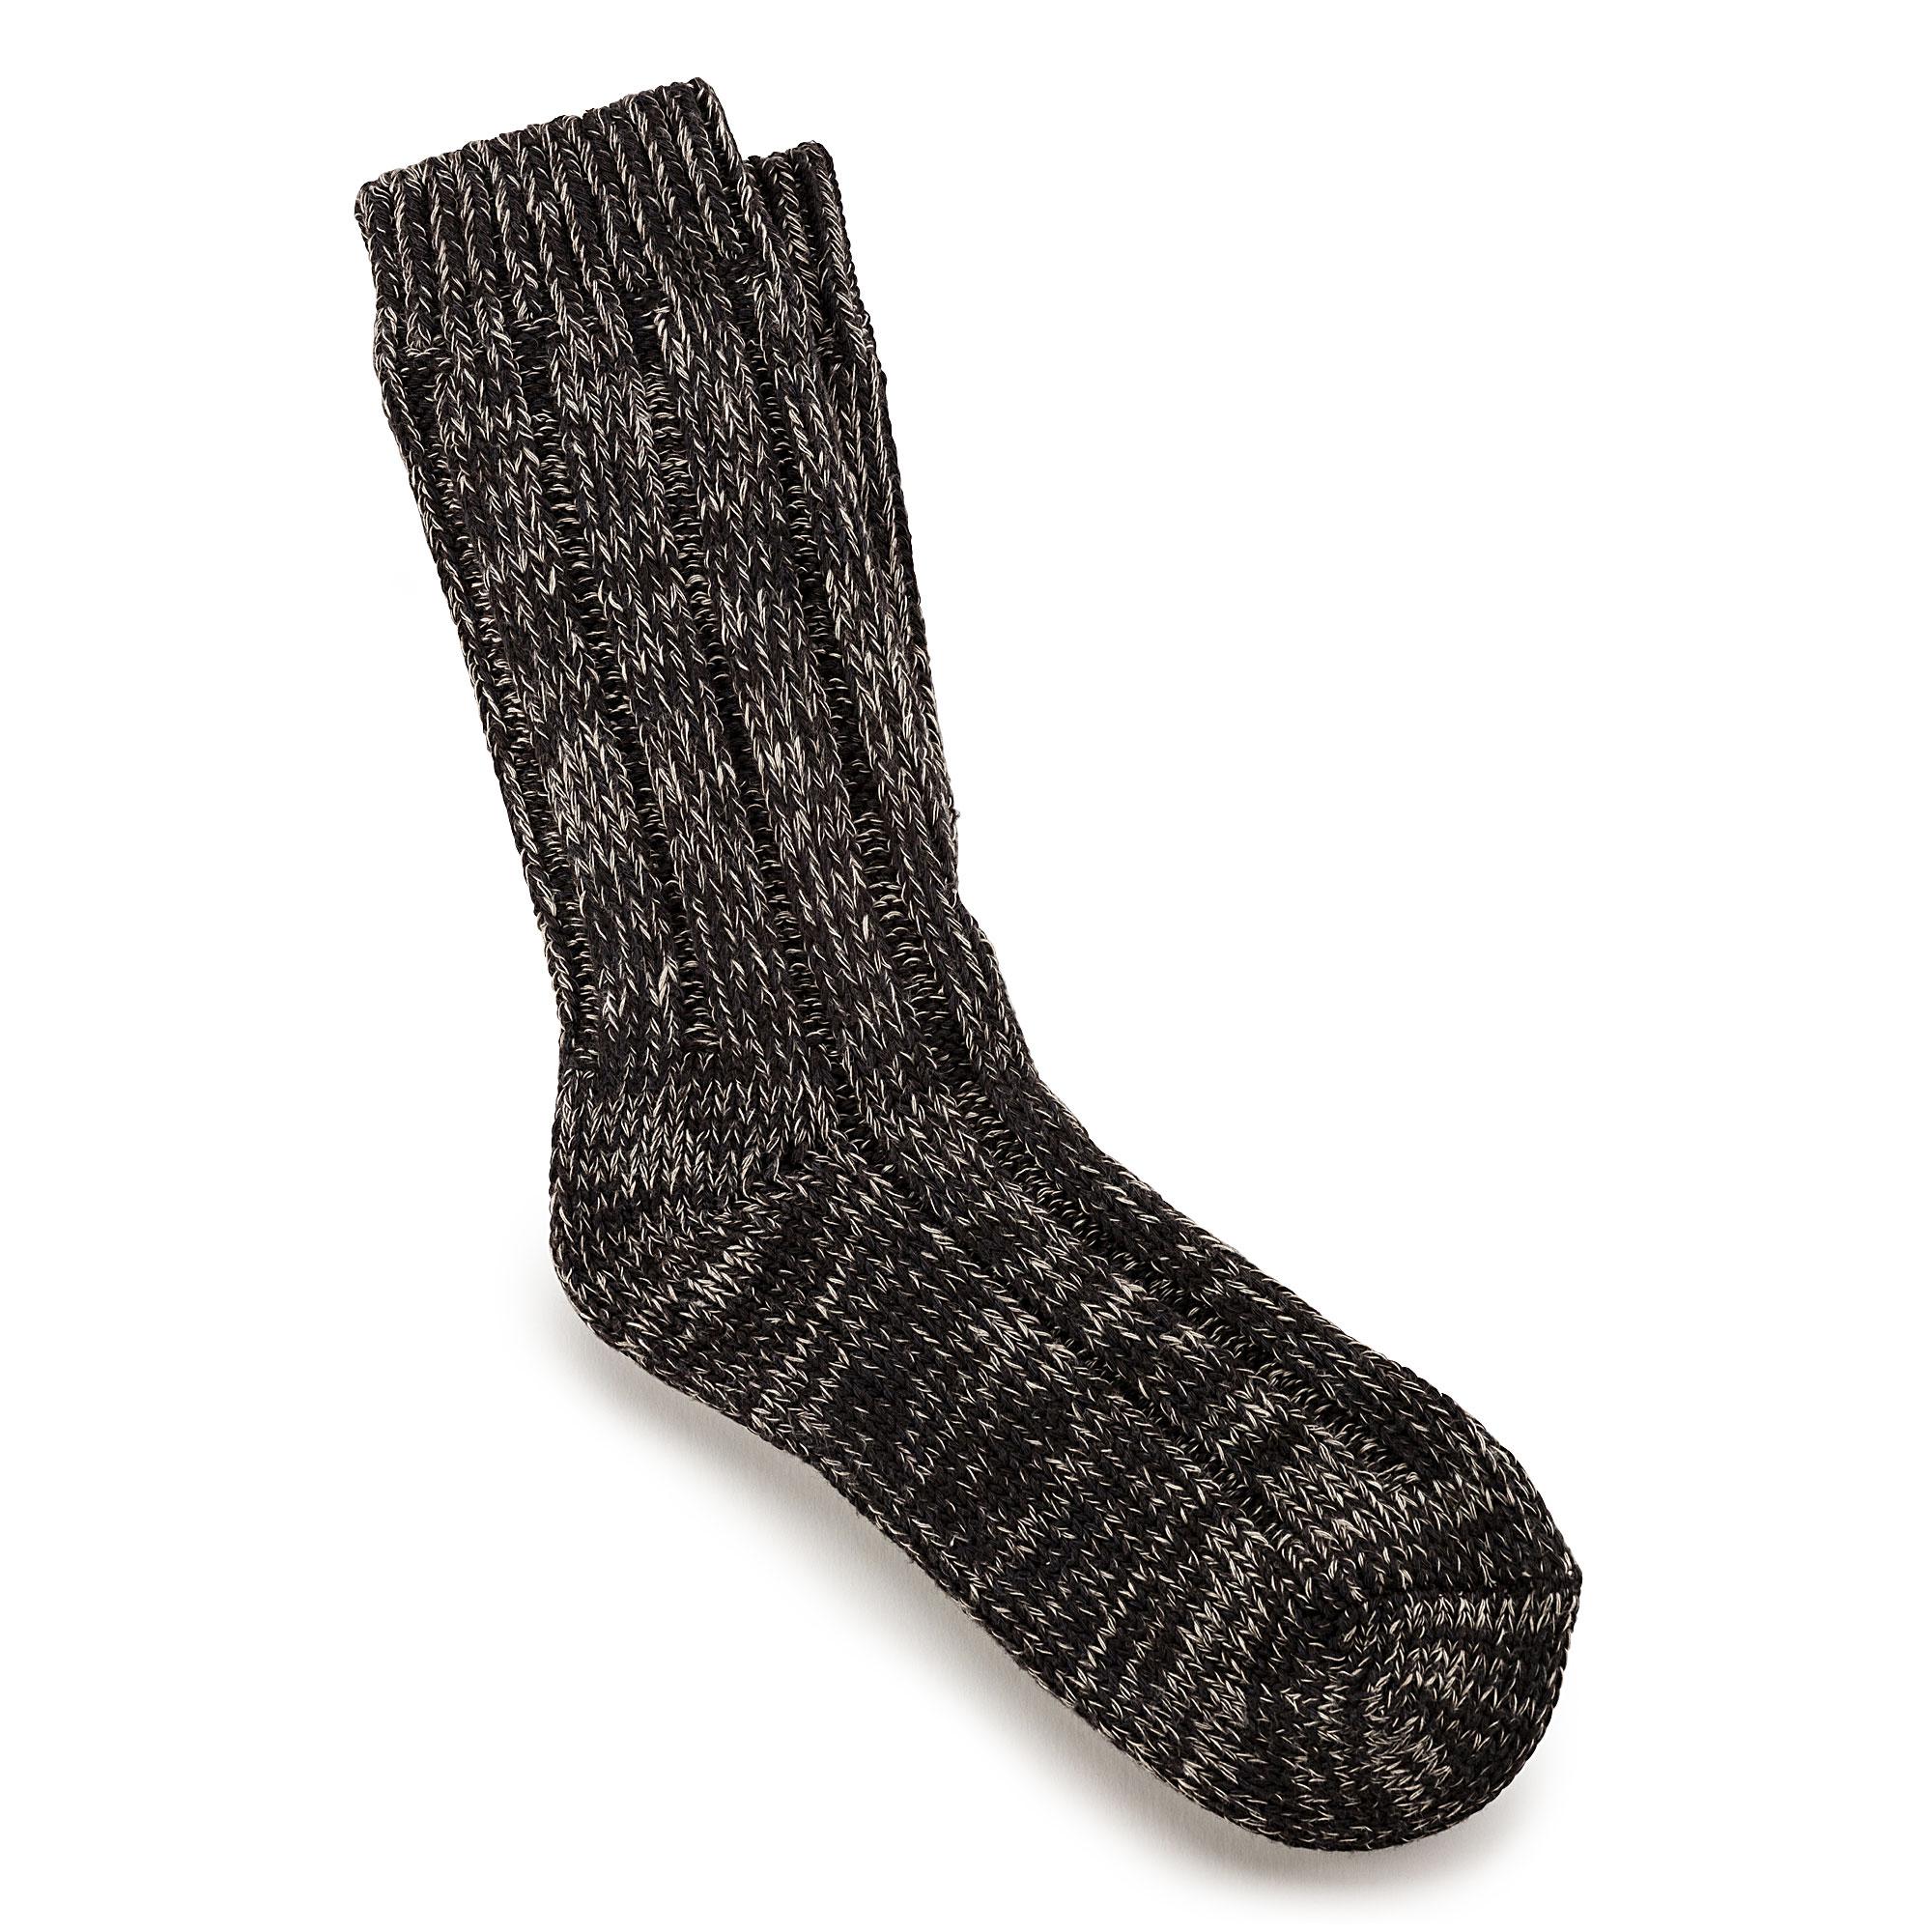 06f6ed06c384 Socke Sydney Brown